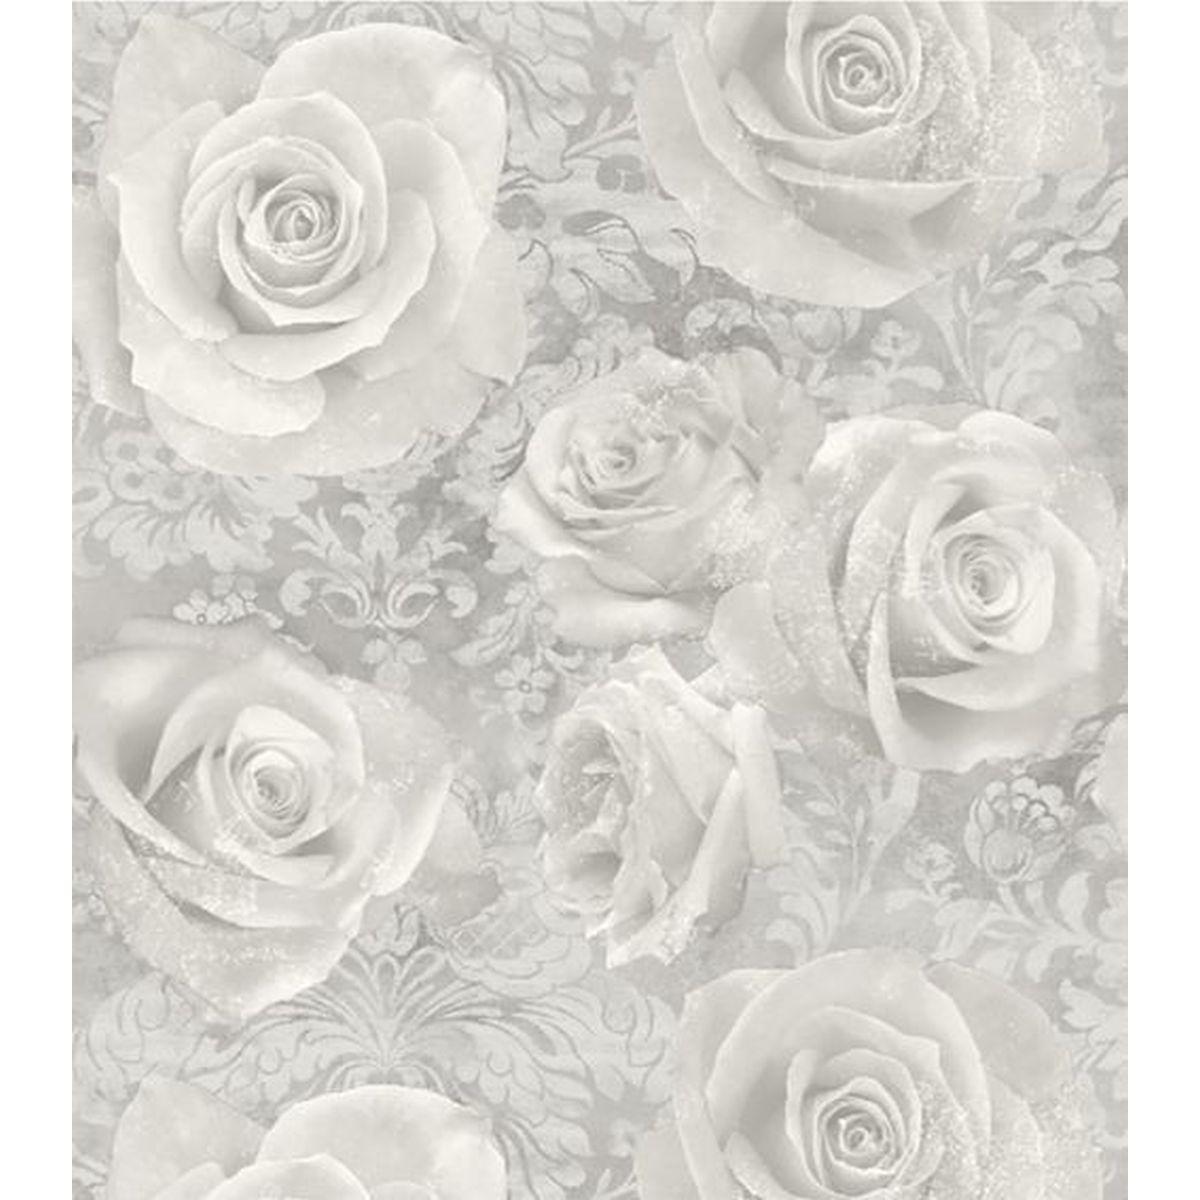 Best of Arthouse Vliestapete Qualitätsvolle Tapete 623303 Grau Blumentapete